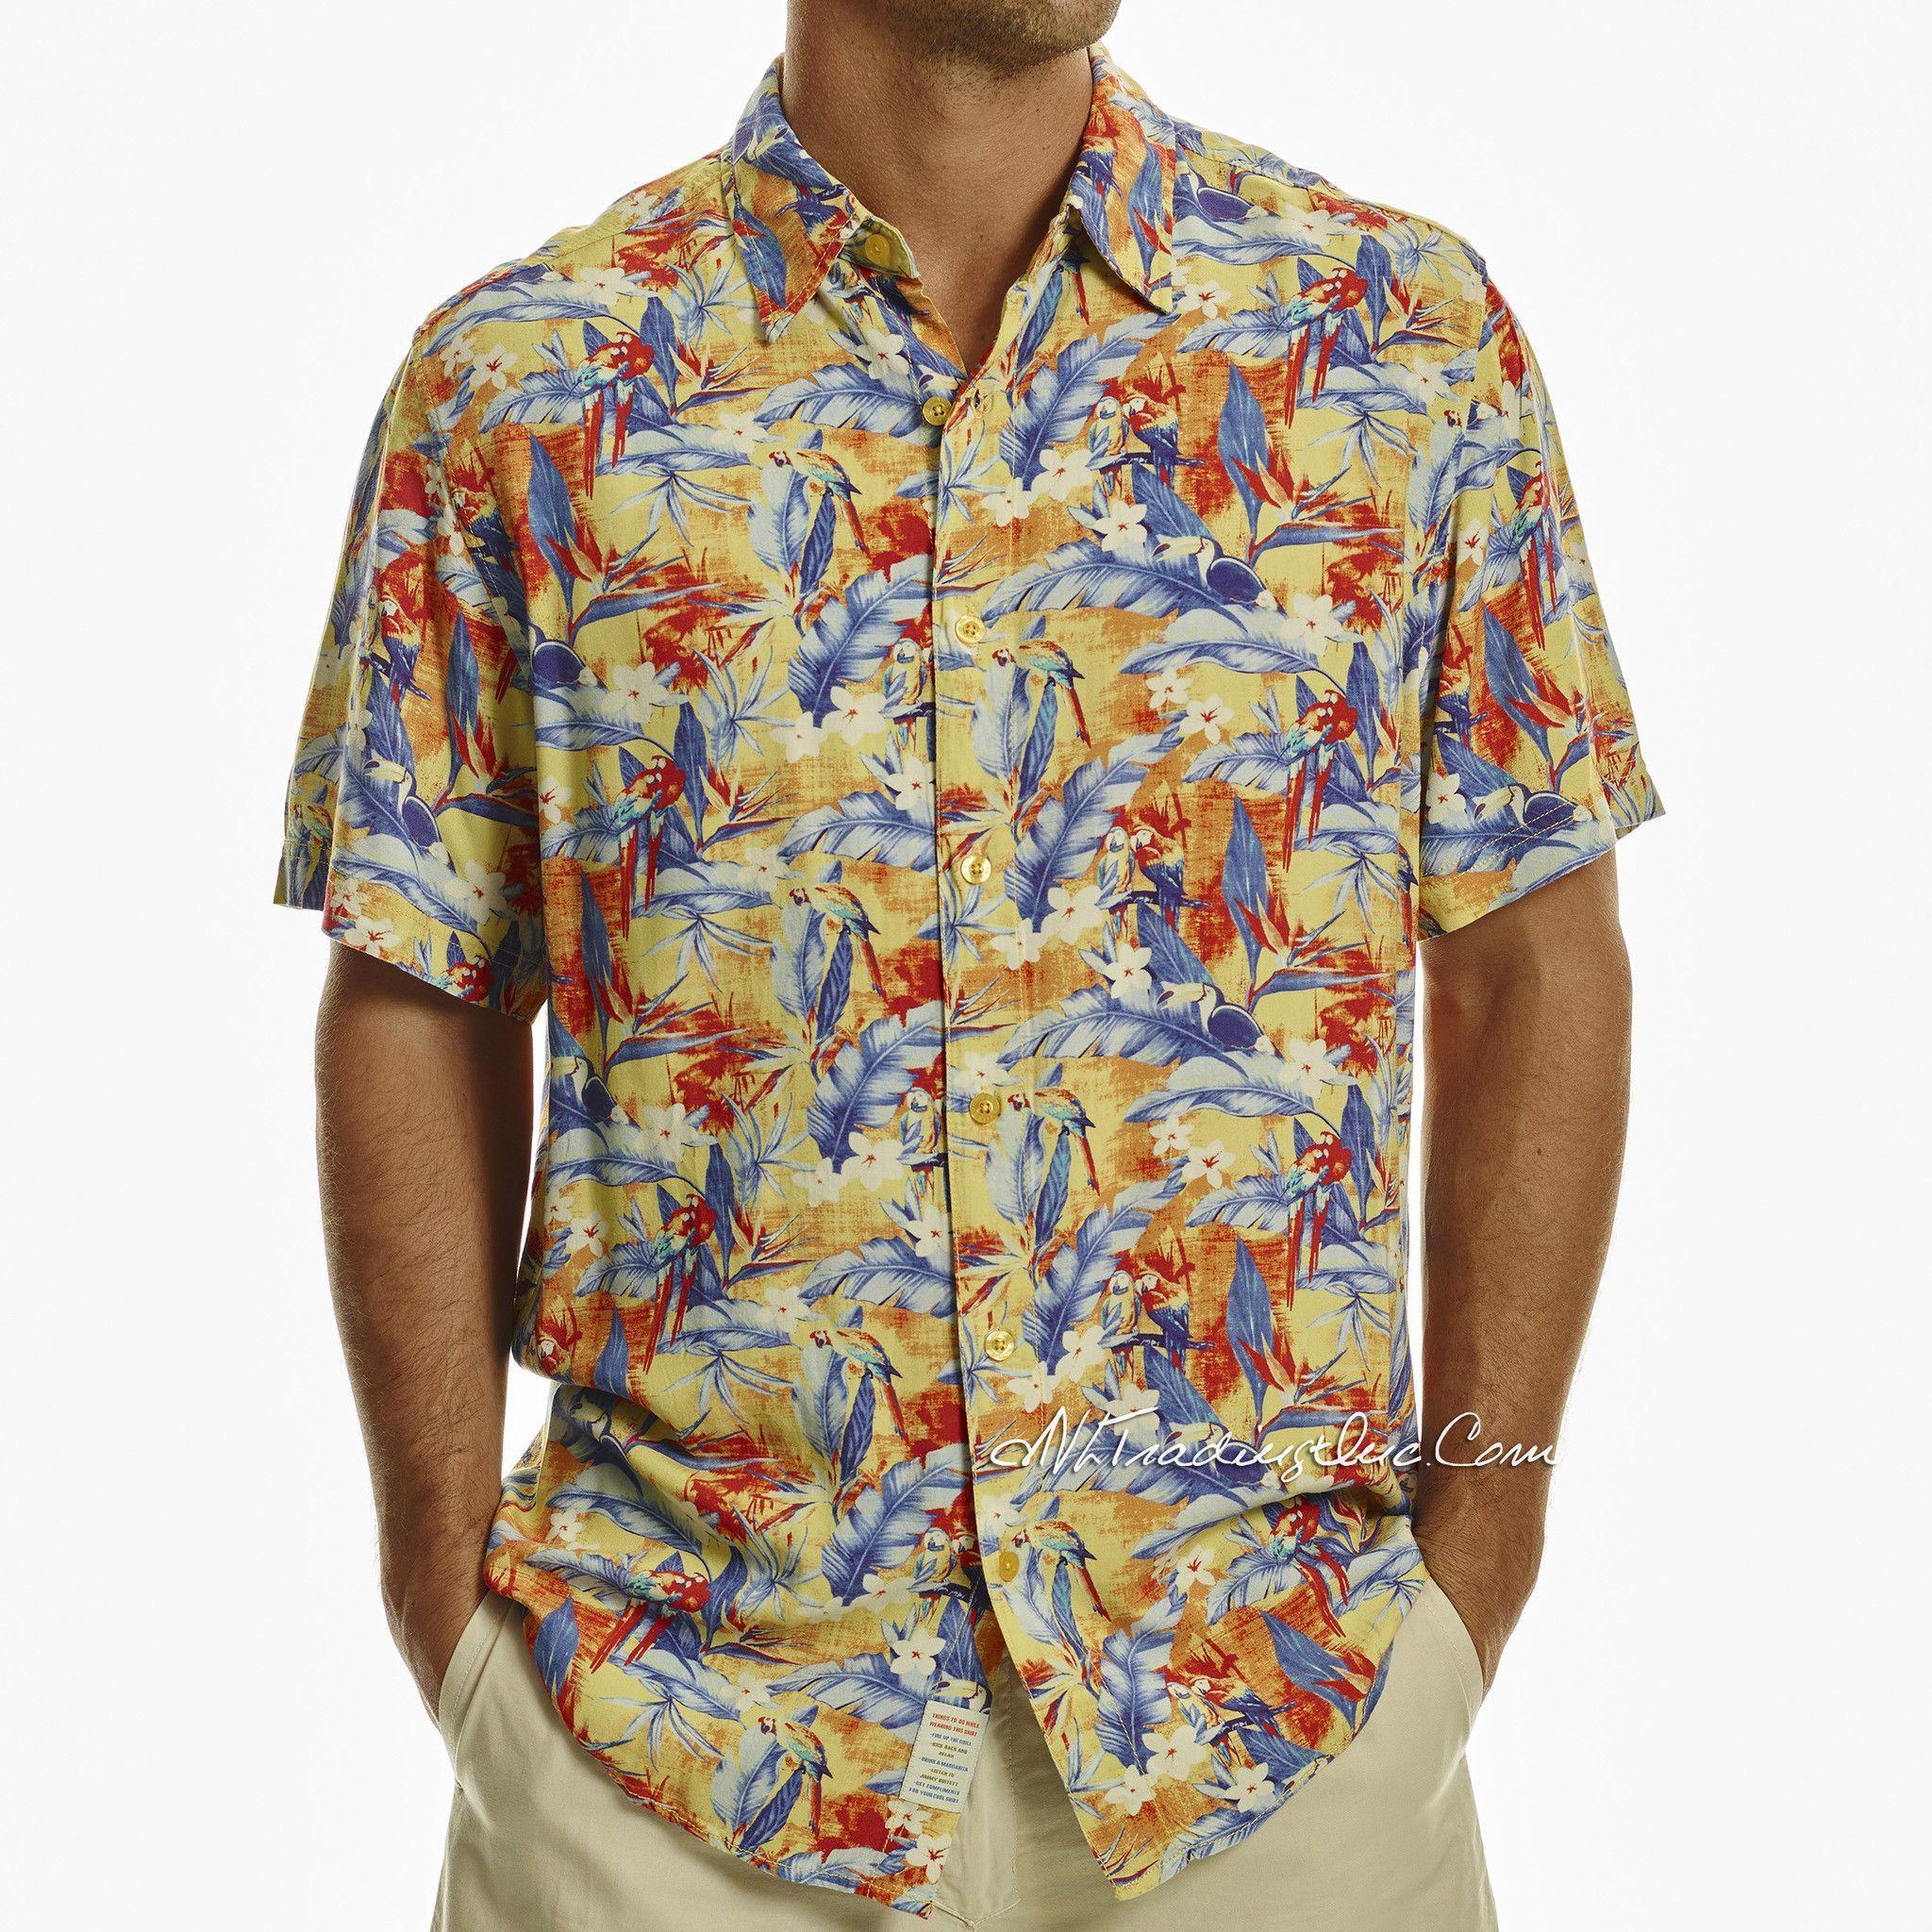 ce2c4a6281e Margaritaville Men Rayon Short Sleeve BBQ Beach Button Front Tropical Shirt  Parrotdise (Blue Yellow)